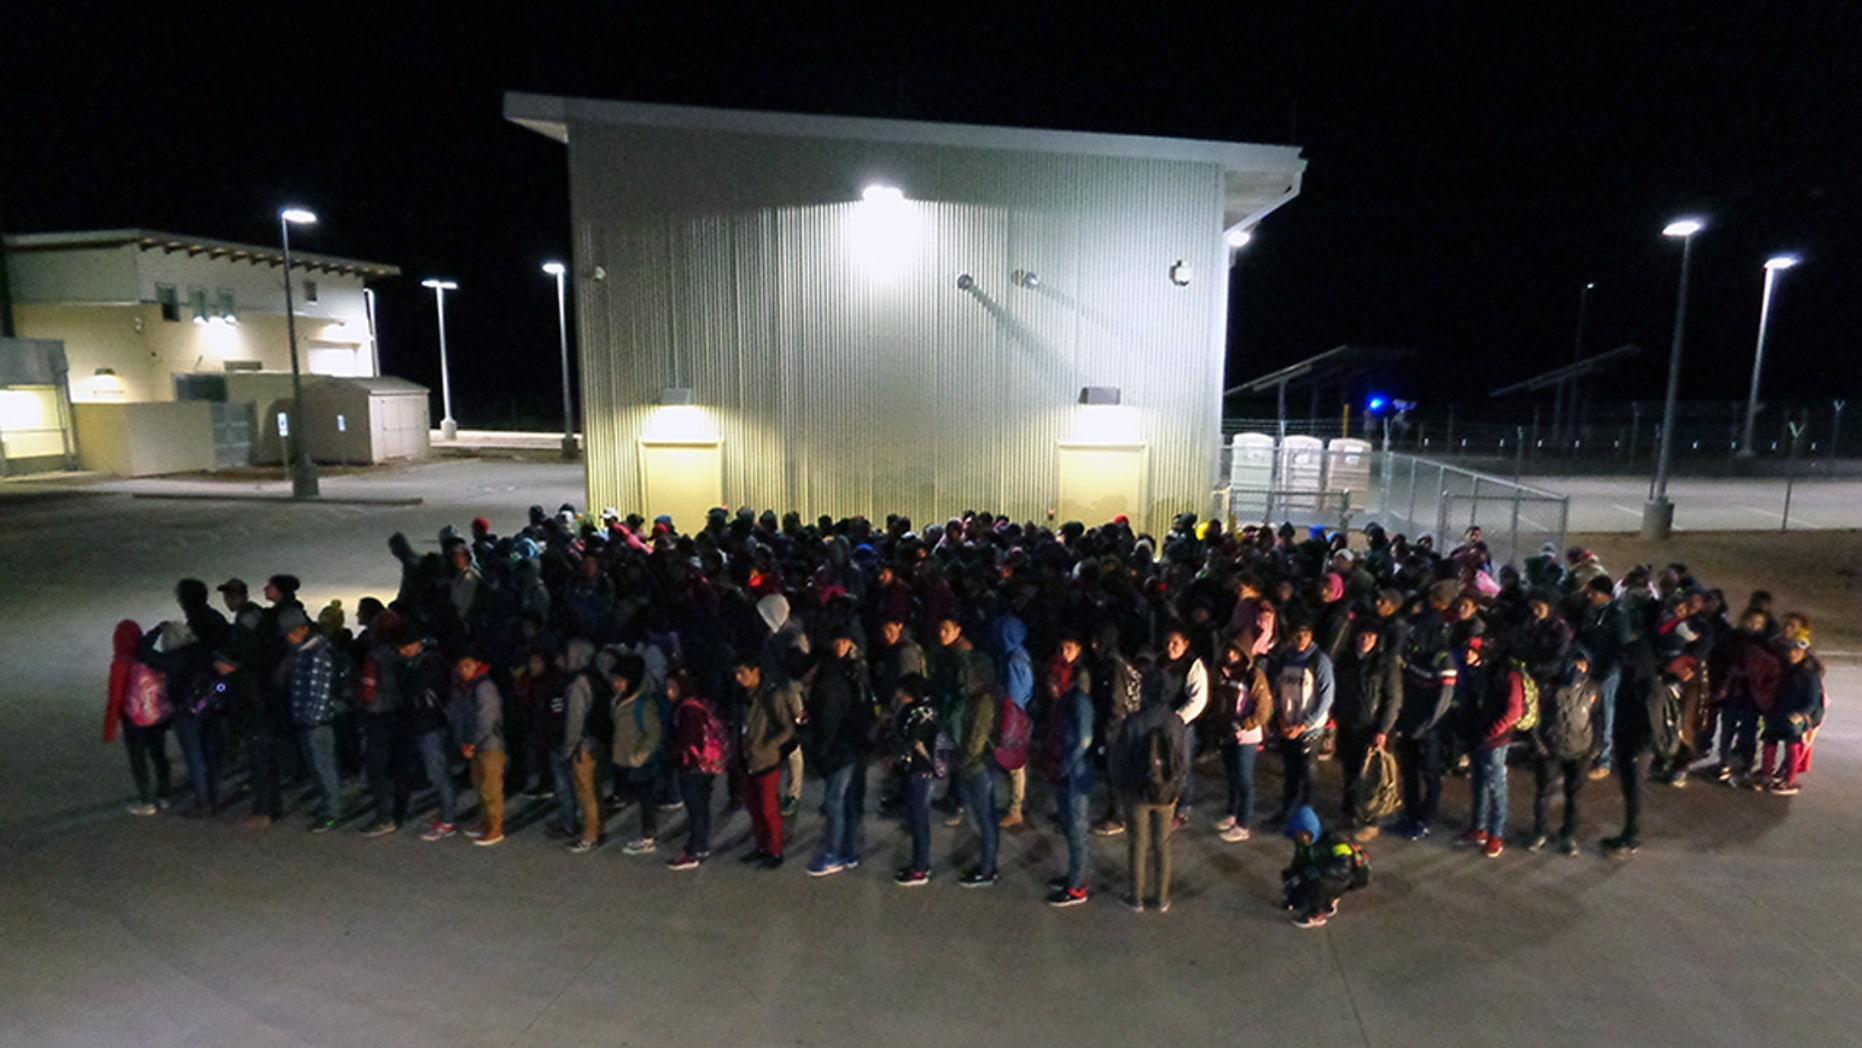 The 330 migrants apprehended at Antelope Wells, N.M.